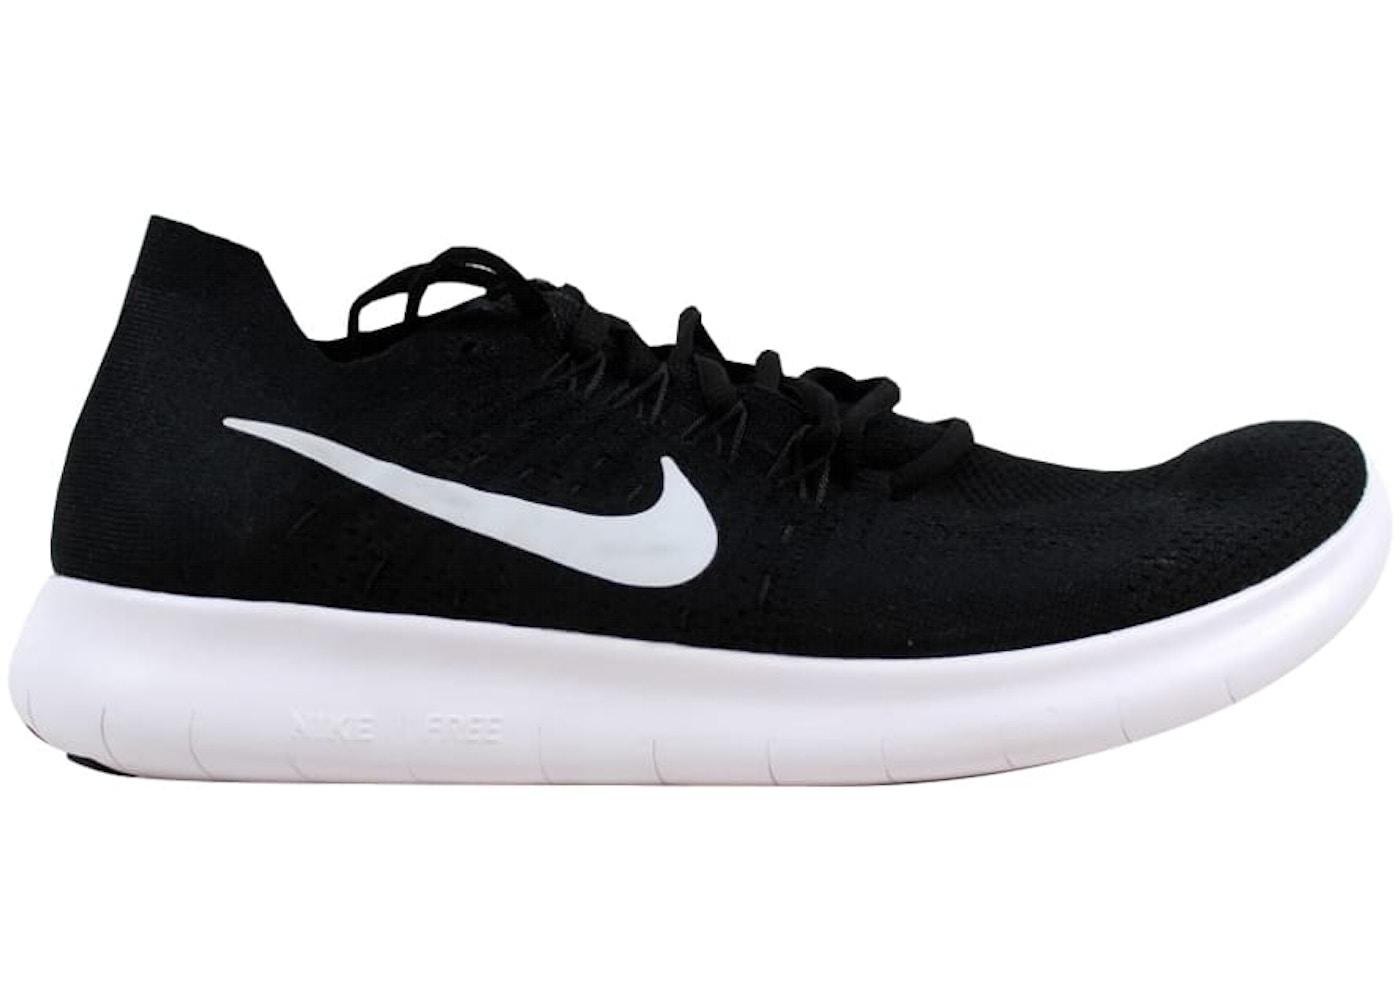 super popular ce2e1 f4150 Nike Free RN Flyknit 2017 Black/White-Anthracite (W)